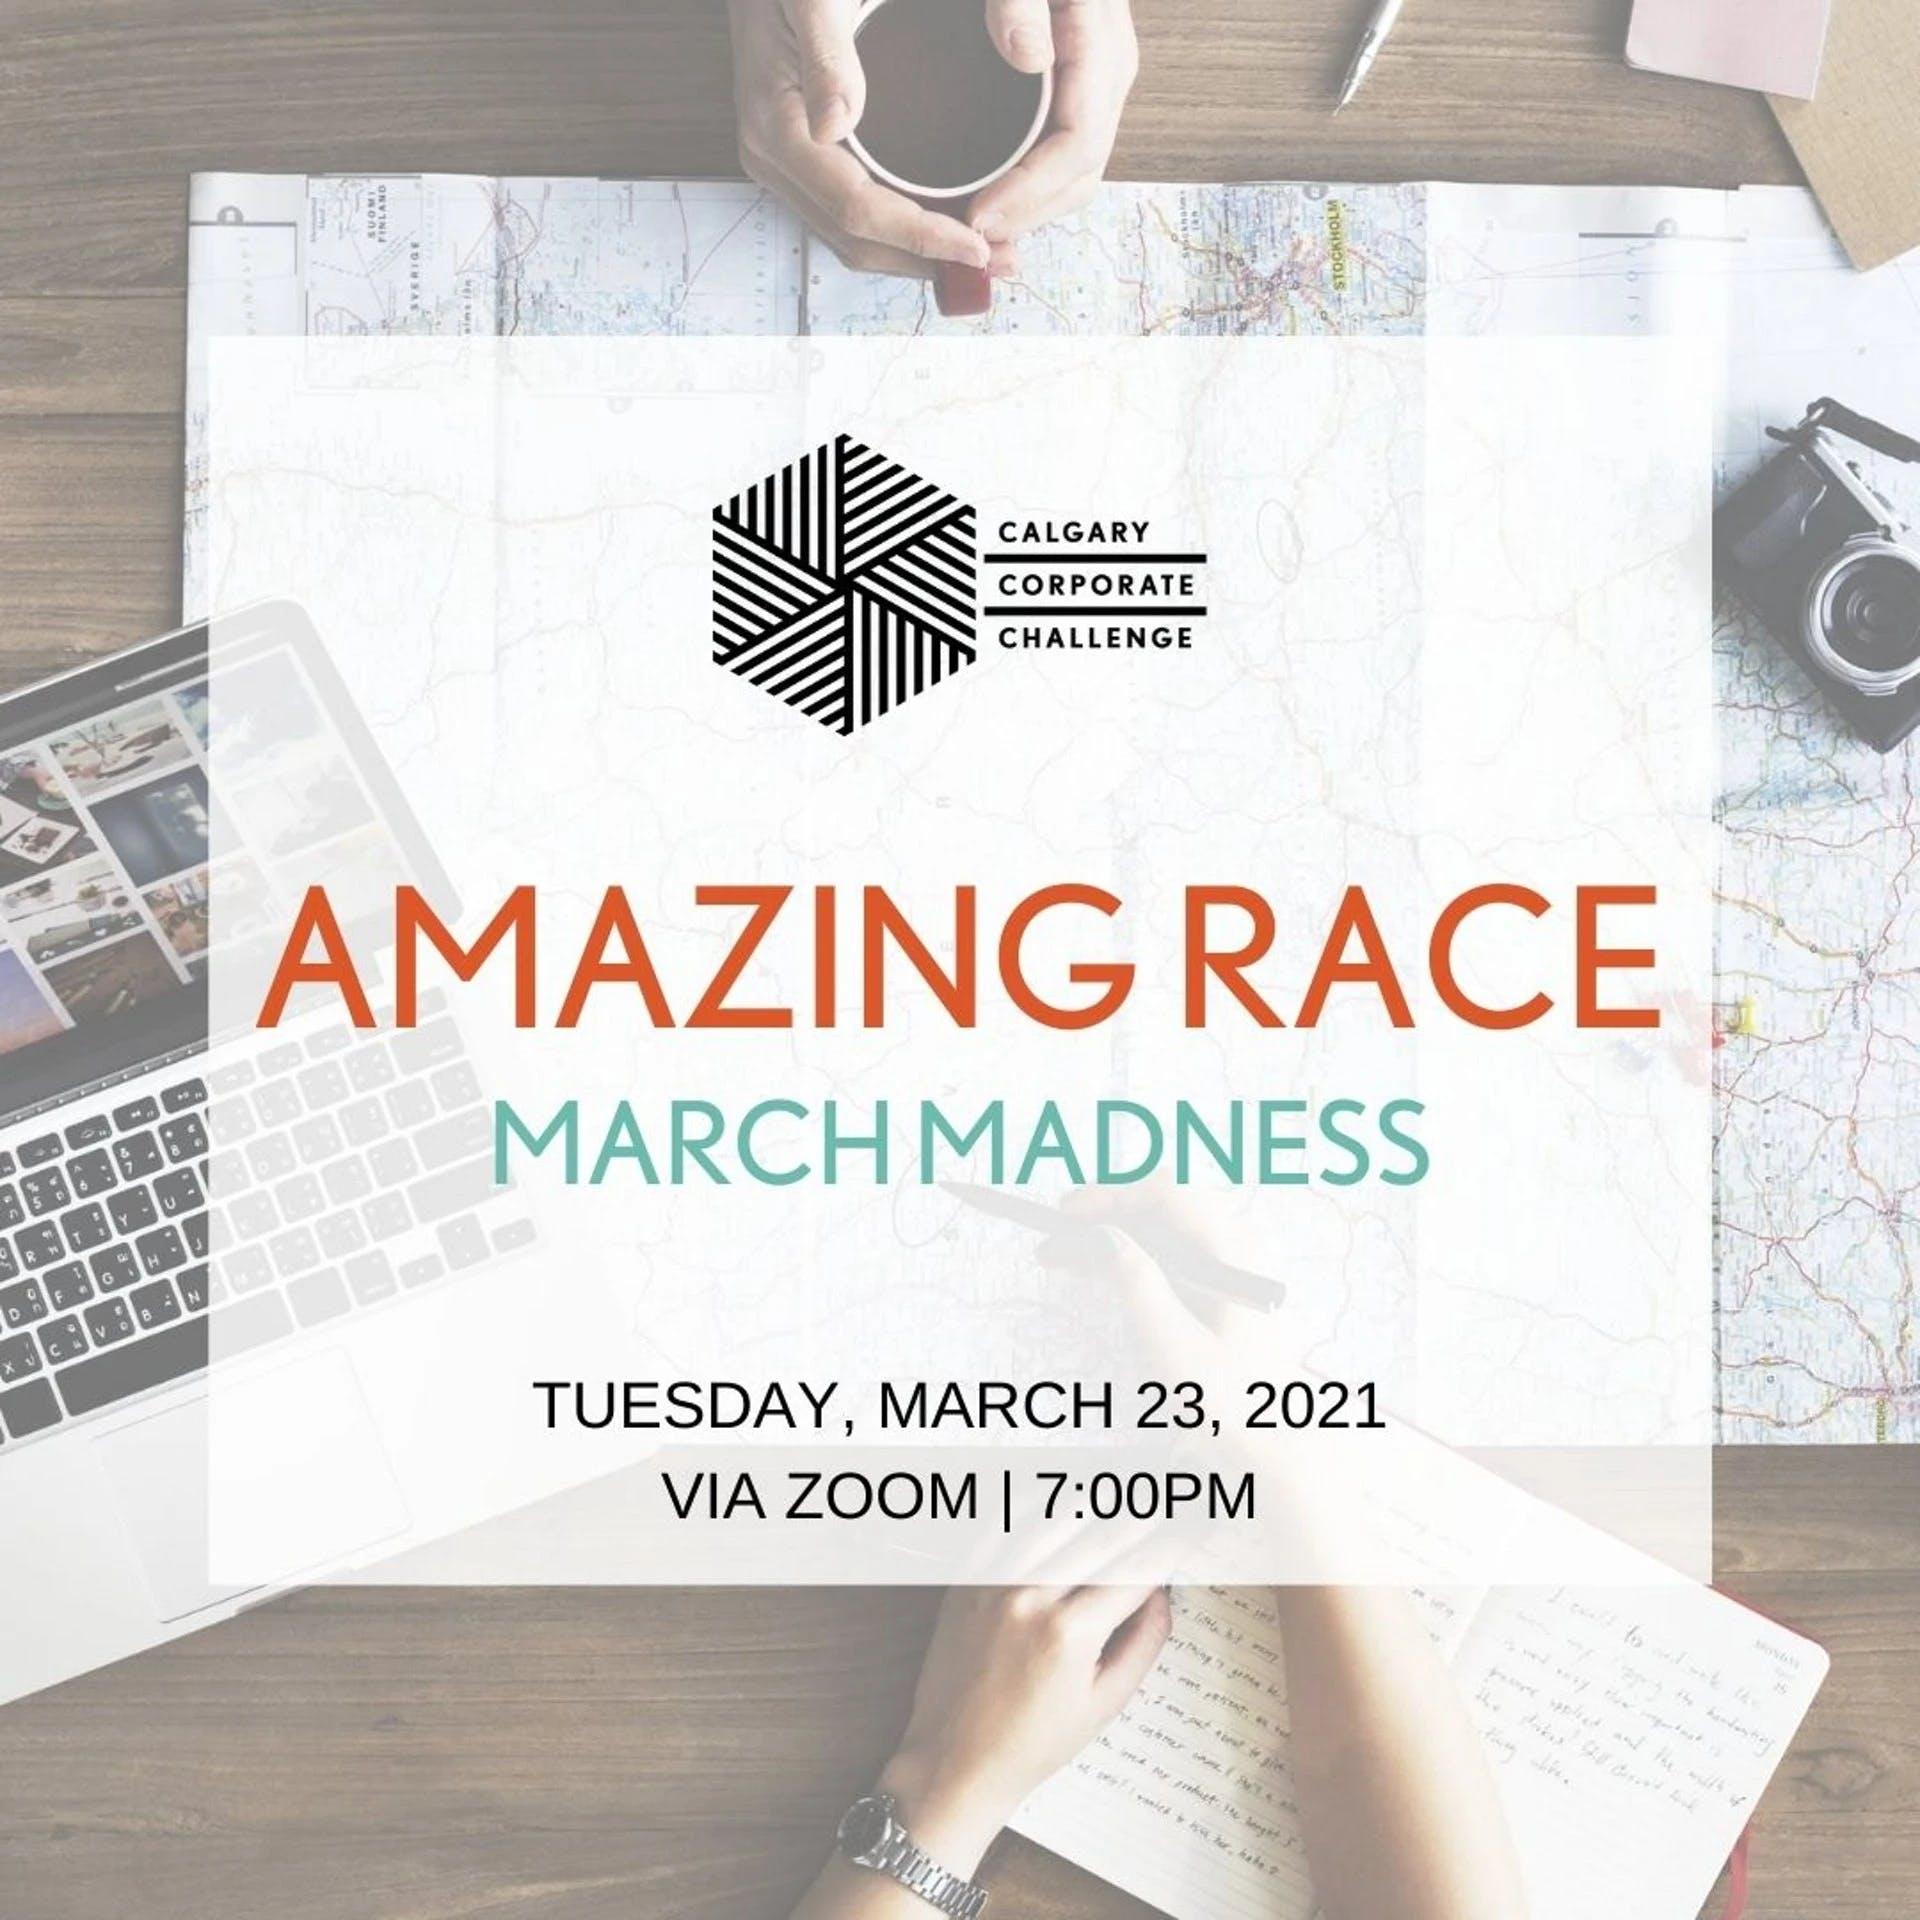 Image advertising the Calgary Corporate Challenge Amazing Race